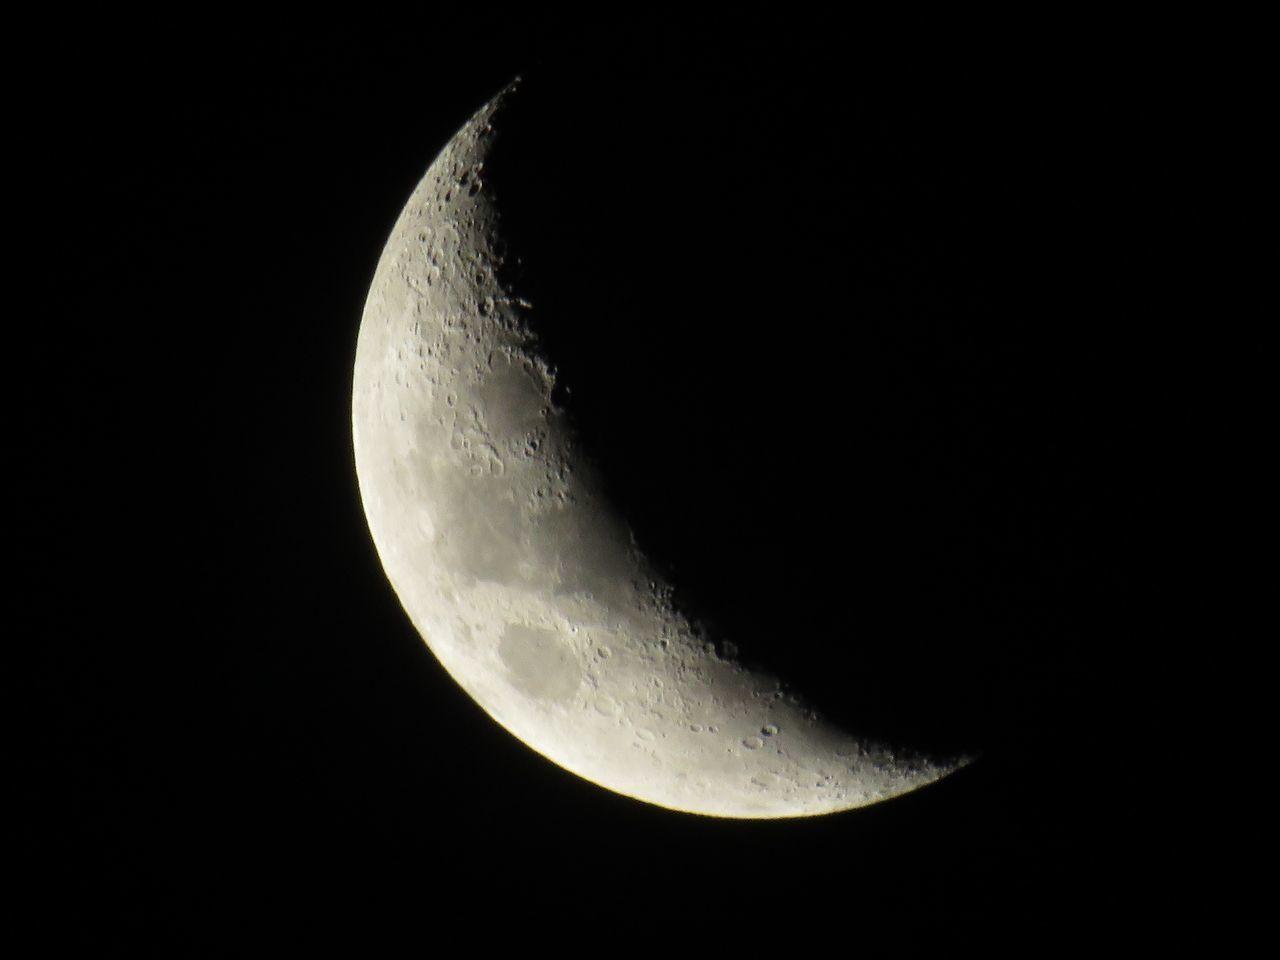 LOW ANGLE VIEW OF HALF MOON AT NIGHT